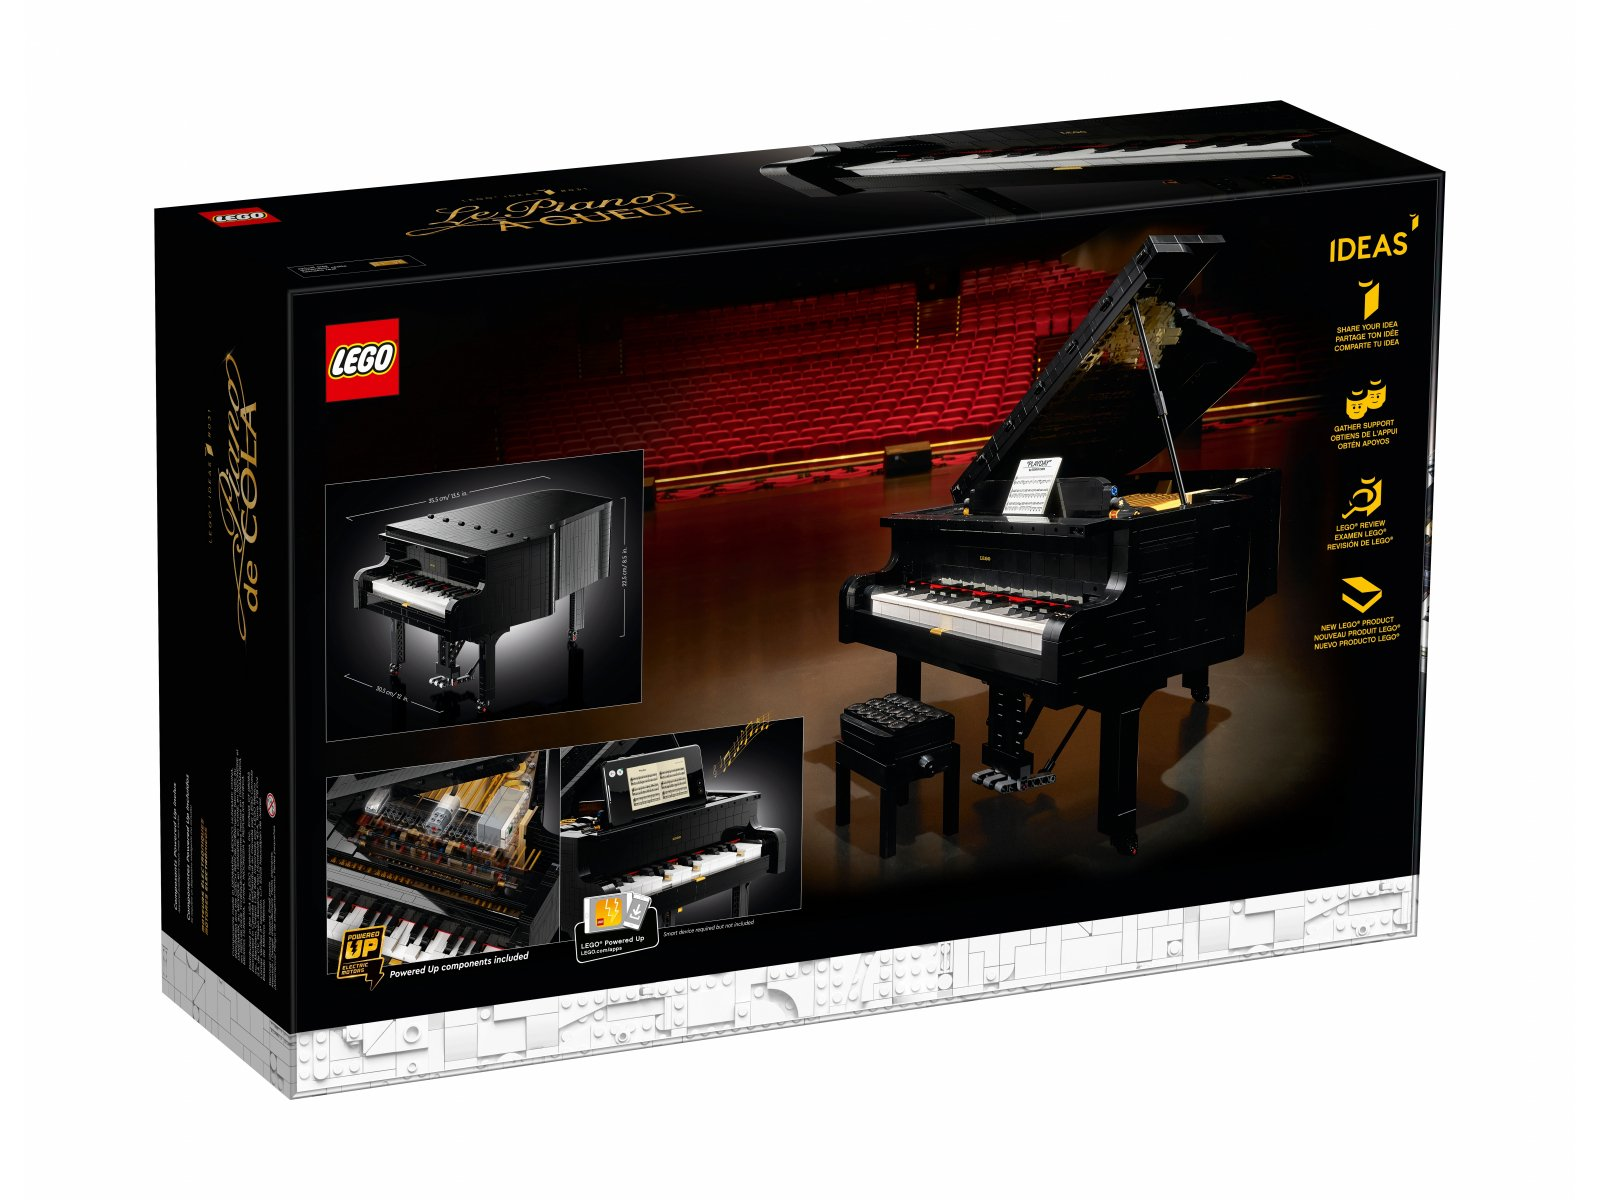 LEGO 21323 Ideas Fortepian